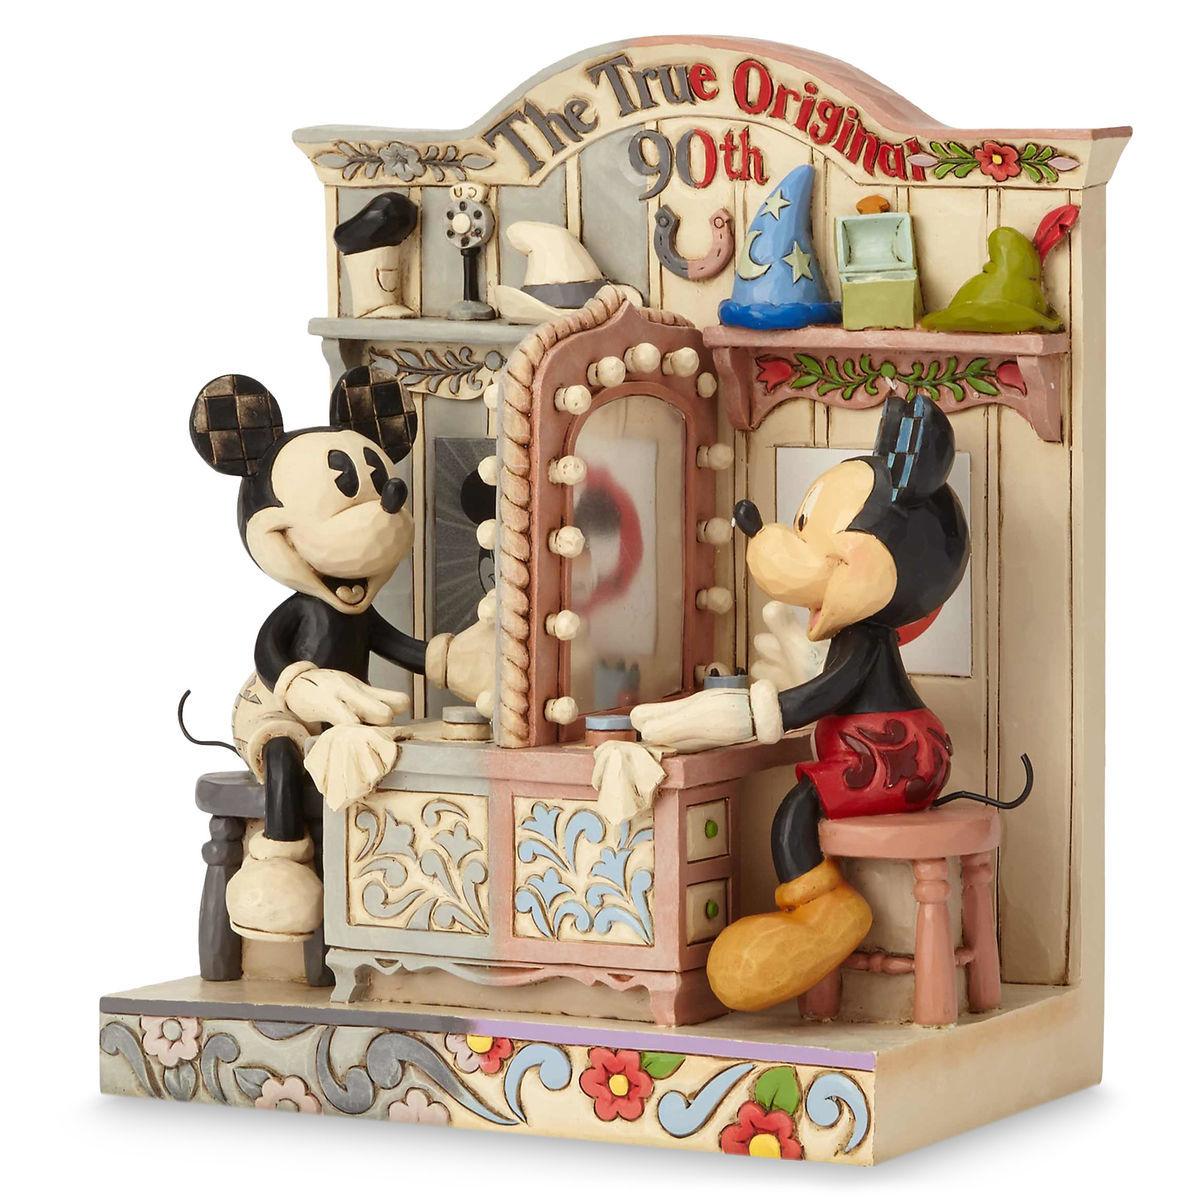 Mickey Mouse Quot The True Original Quot 90th Anniversary Jim Shore Disney Traditions Figurine